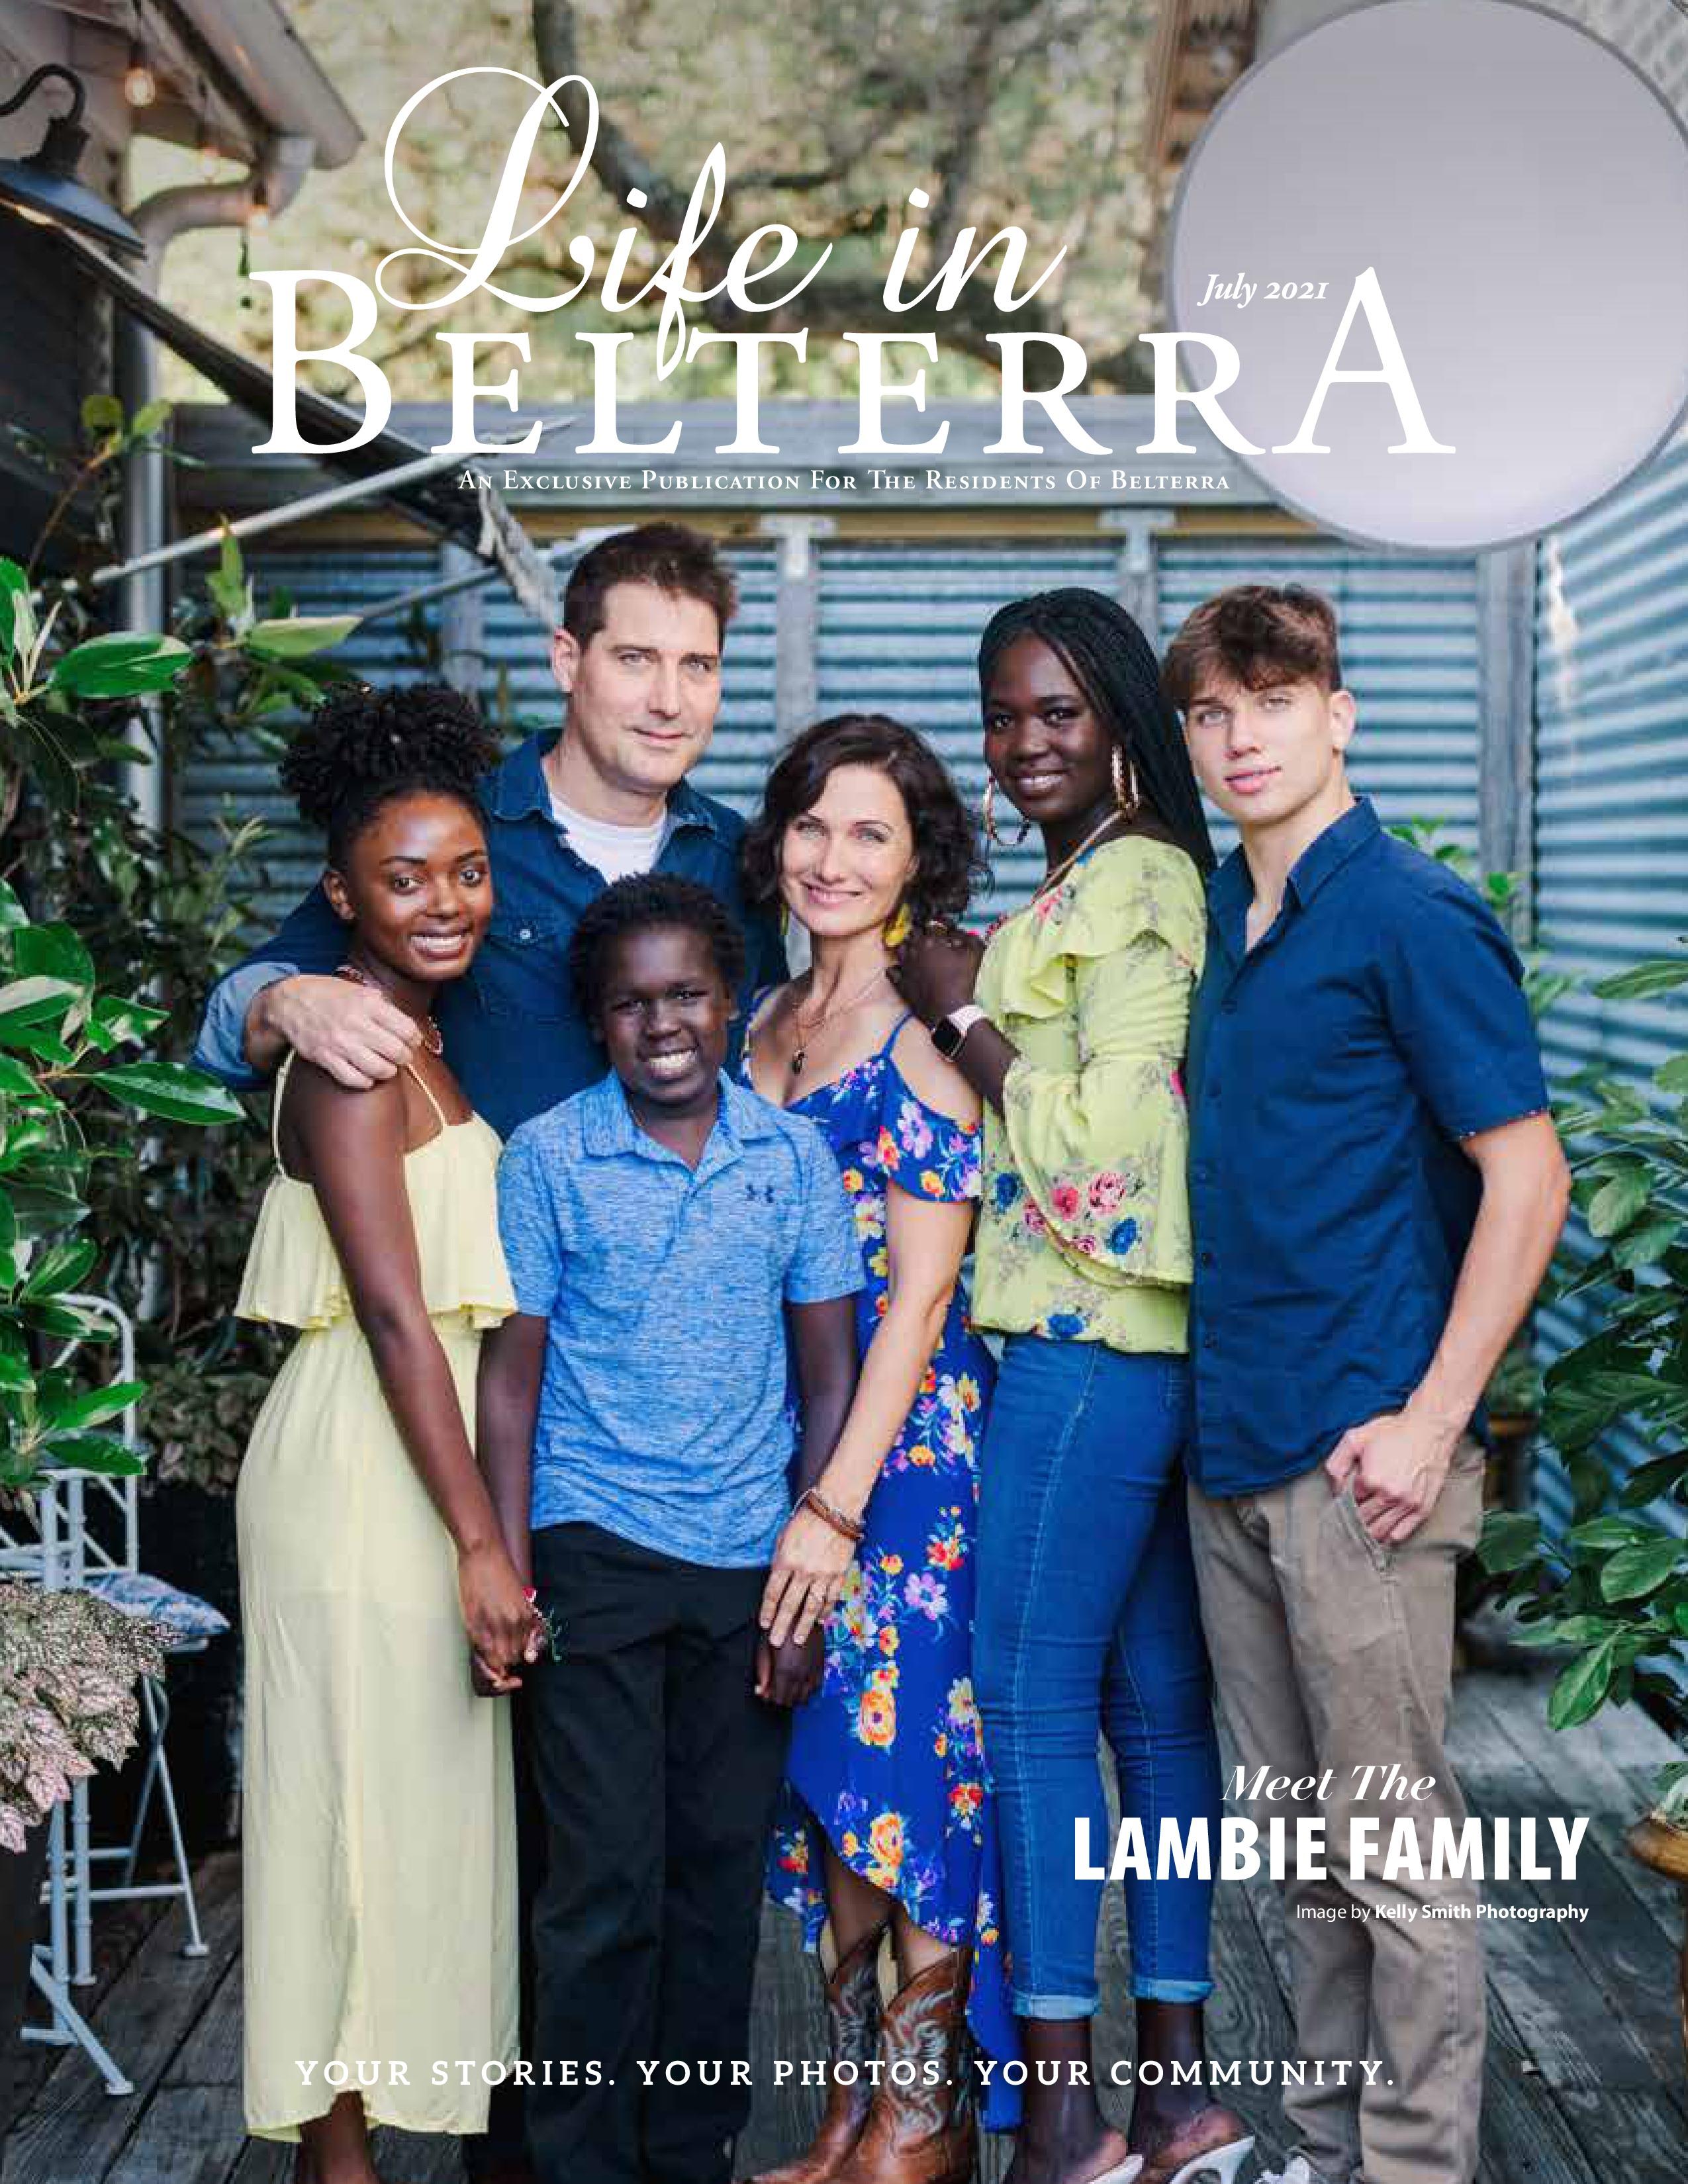 Life in Belterra 2021-07-01